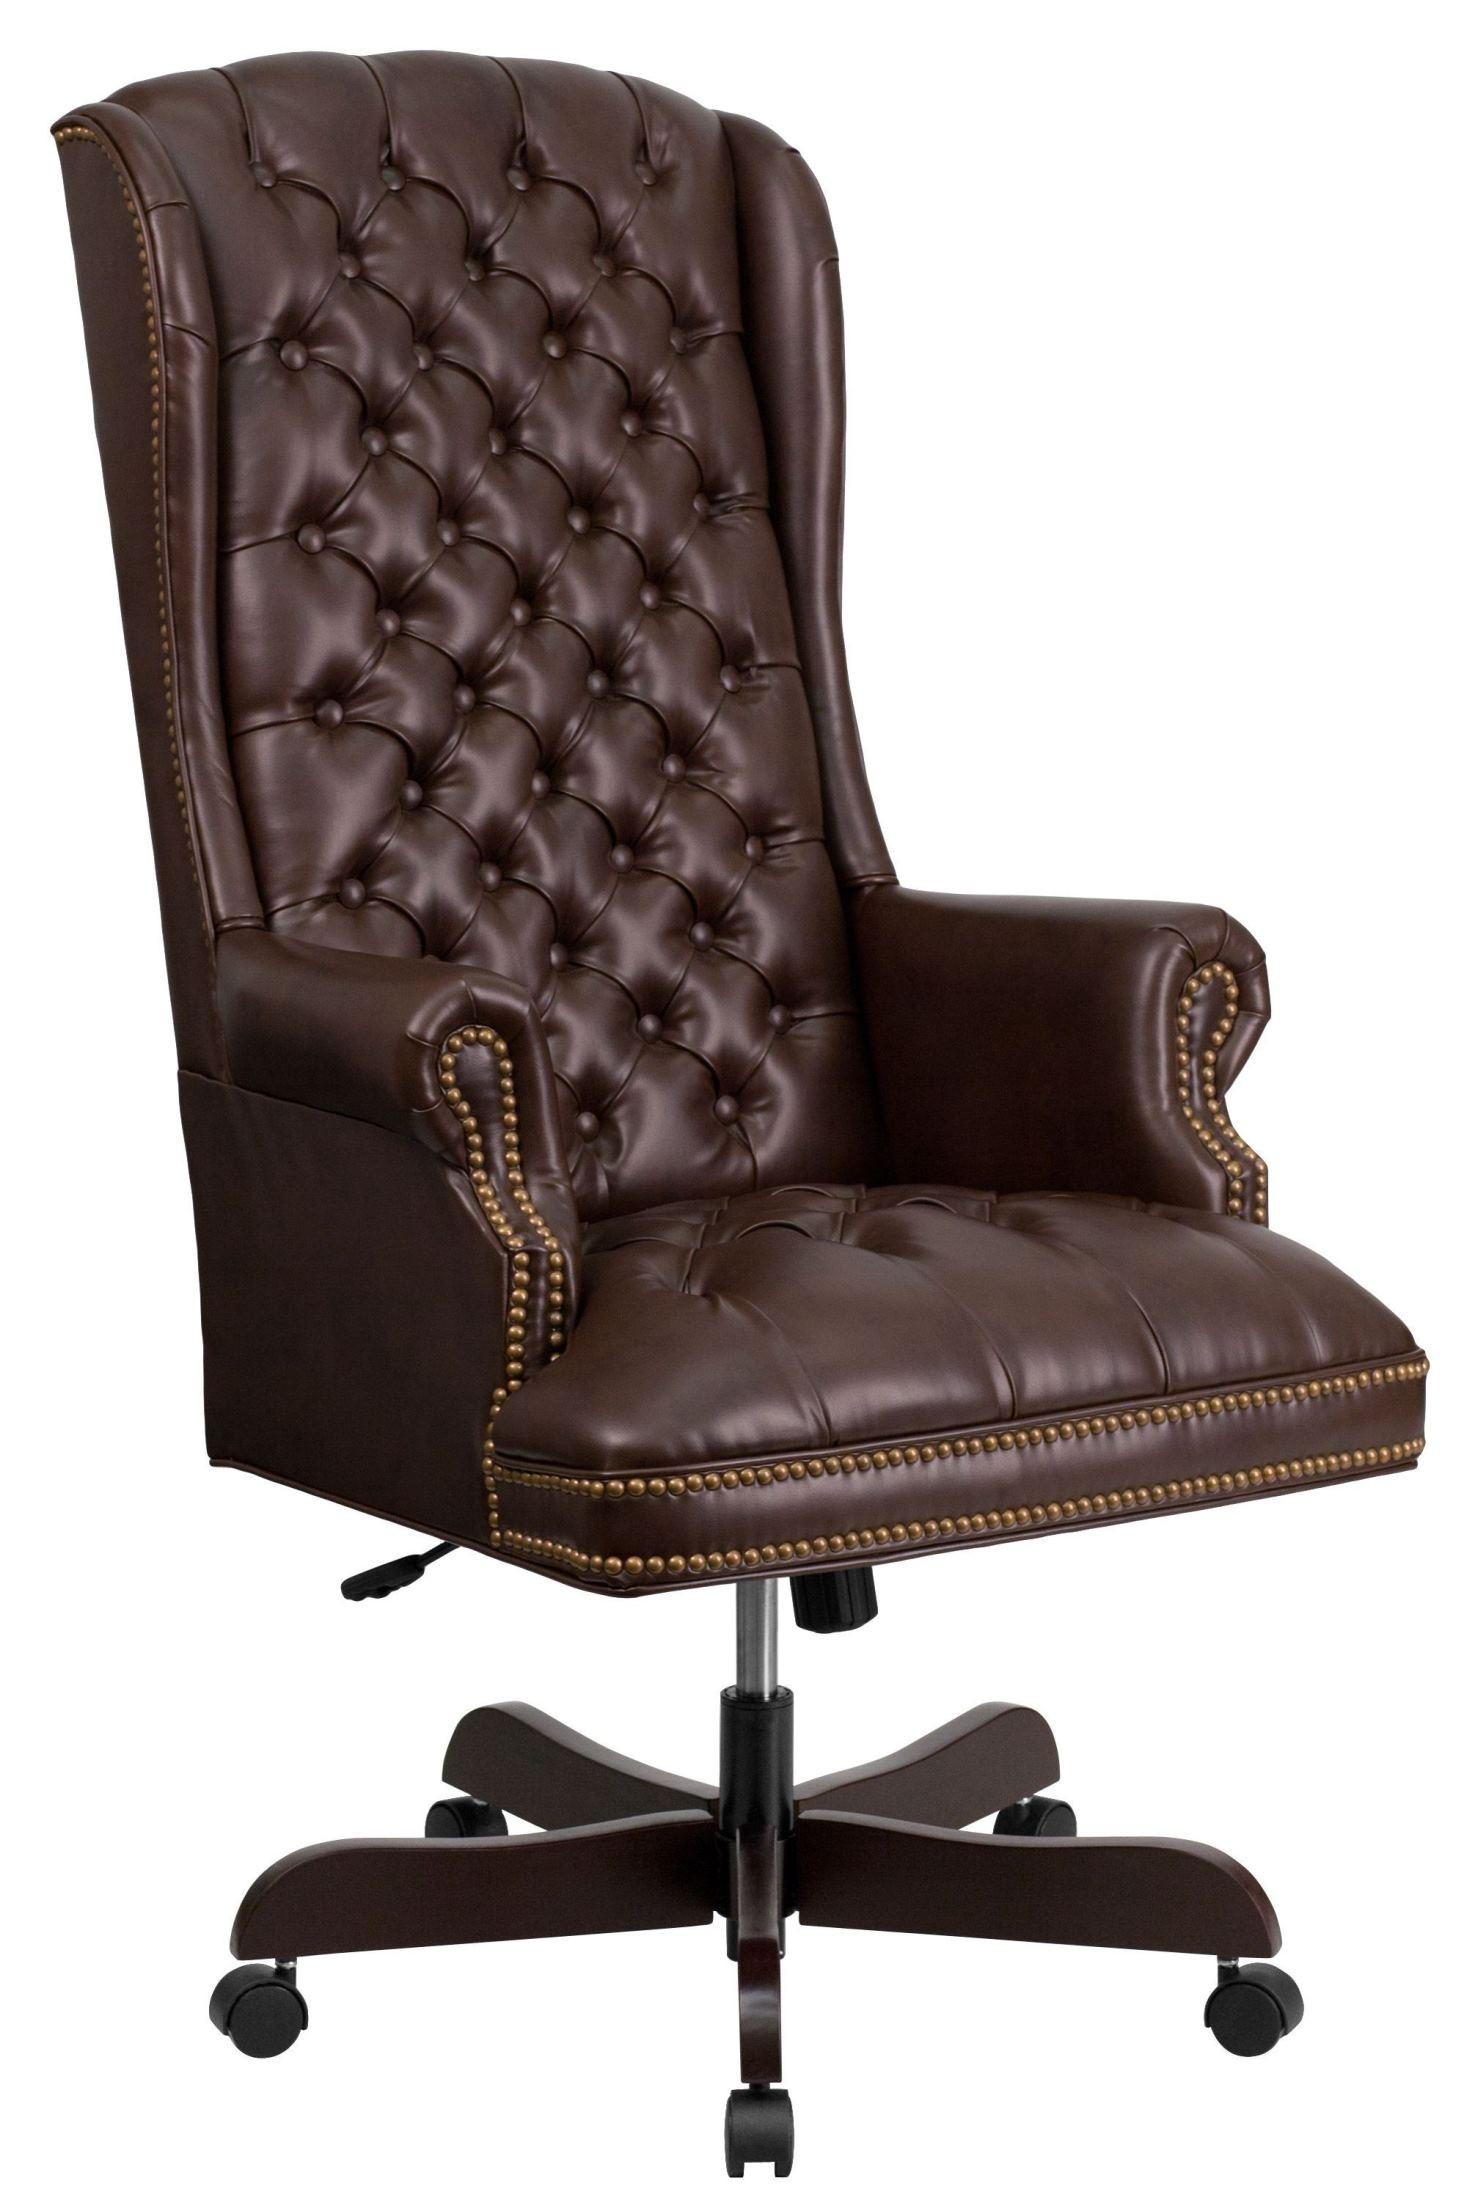 360 brn high back tufted brown leather executive office. Black Bedroom Furniture Sets. Home Design Ideas